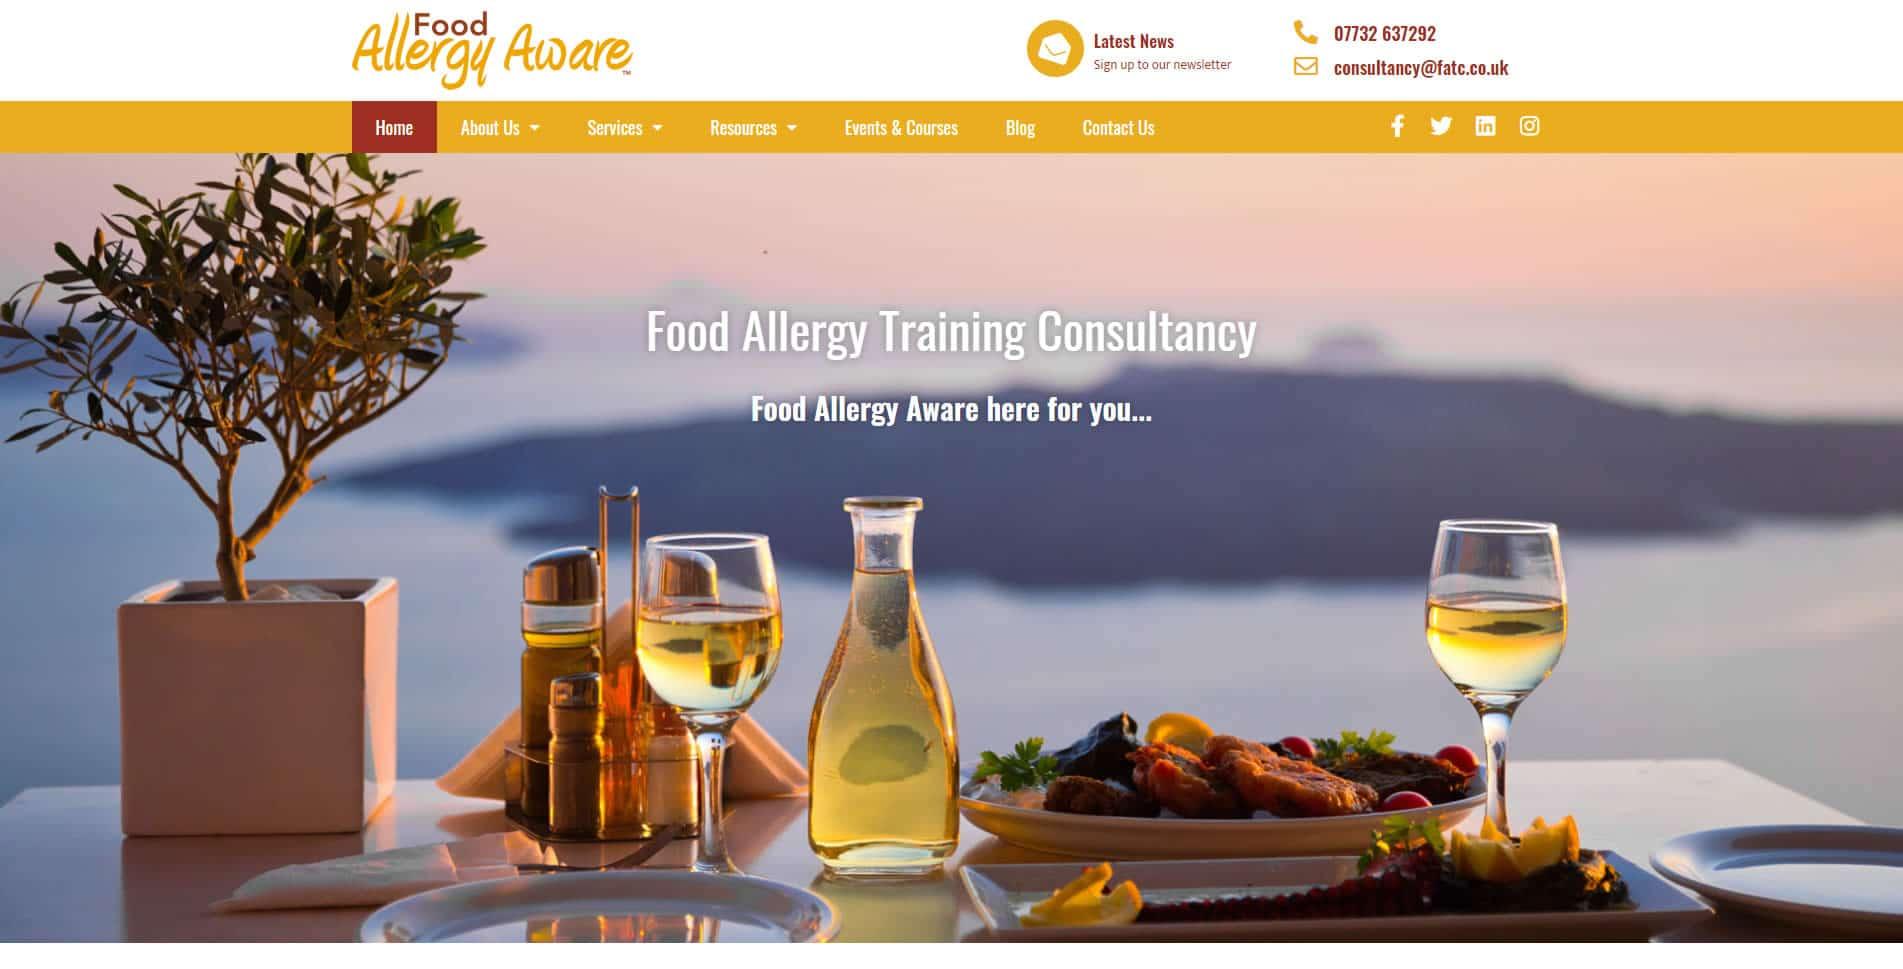 Food Allergy Aware